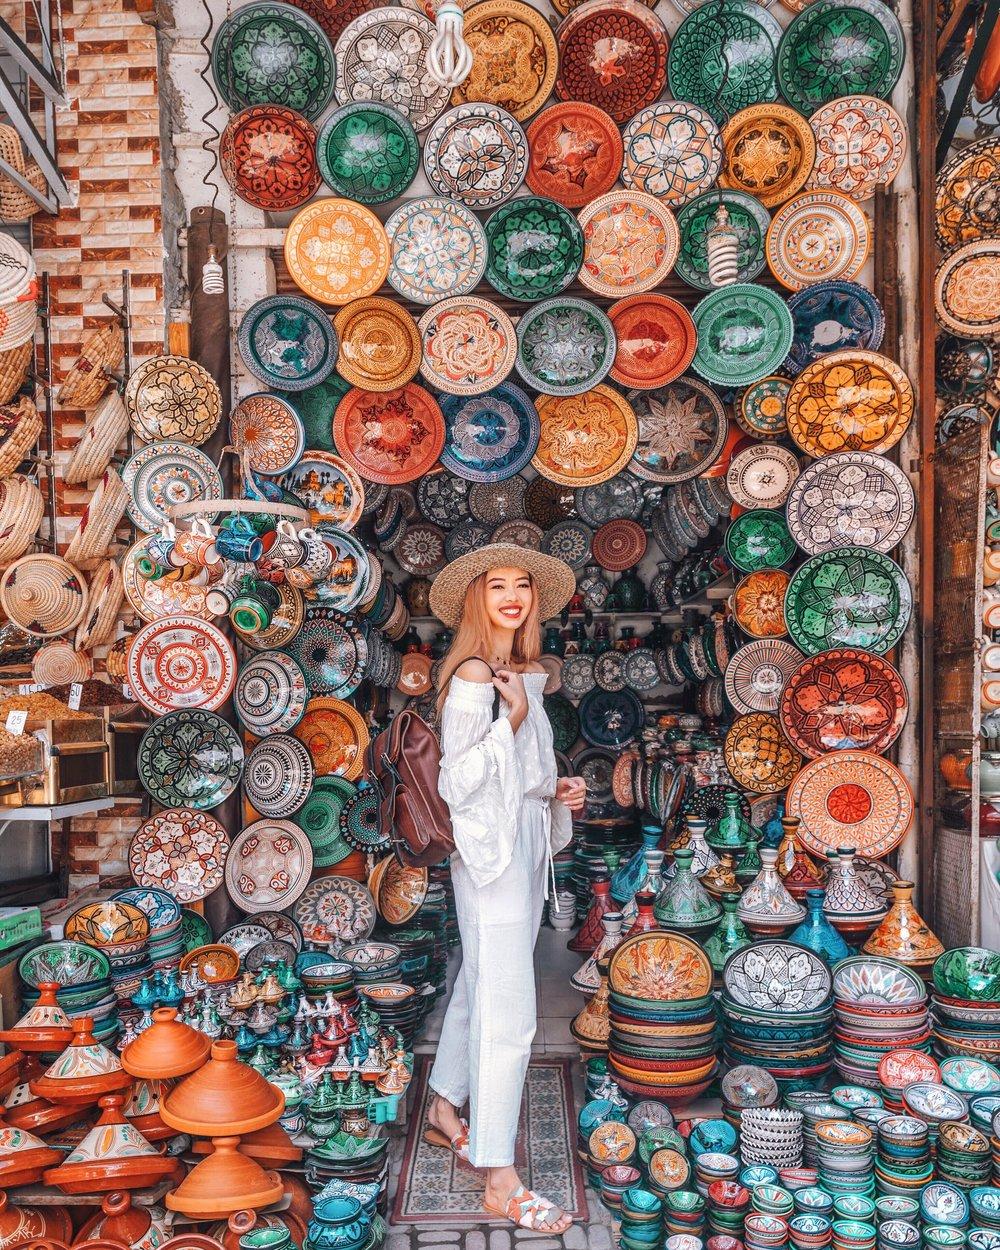 taramilktea instagram Marrakesh photo with Bennybee handmade rucksack